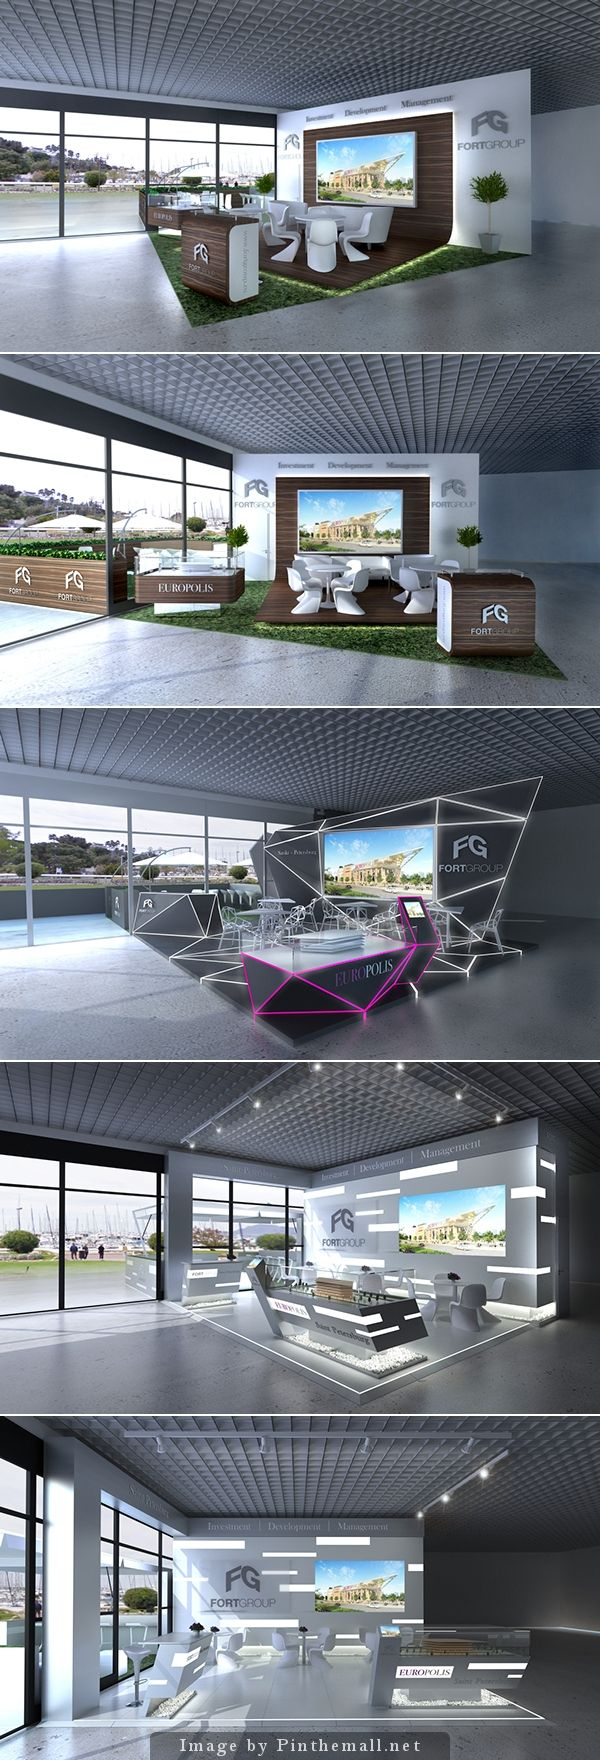 FortGroup Exhibit Brainstorm #installation #design #custom